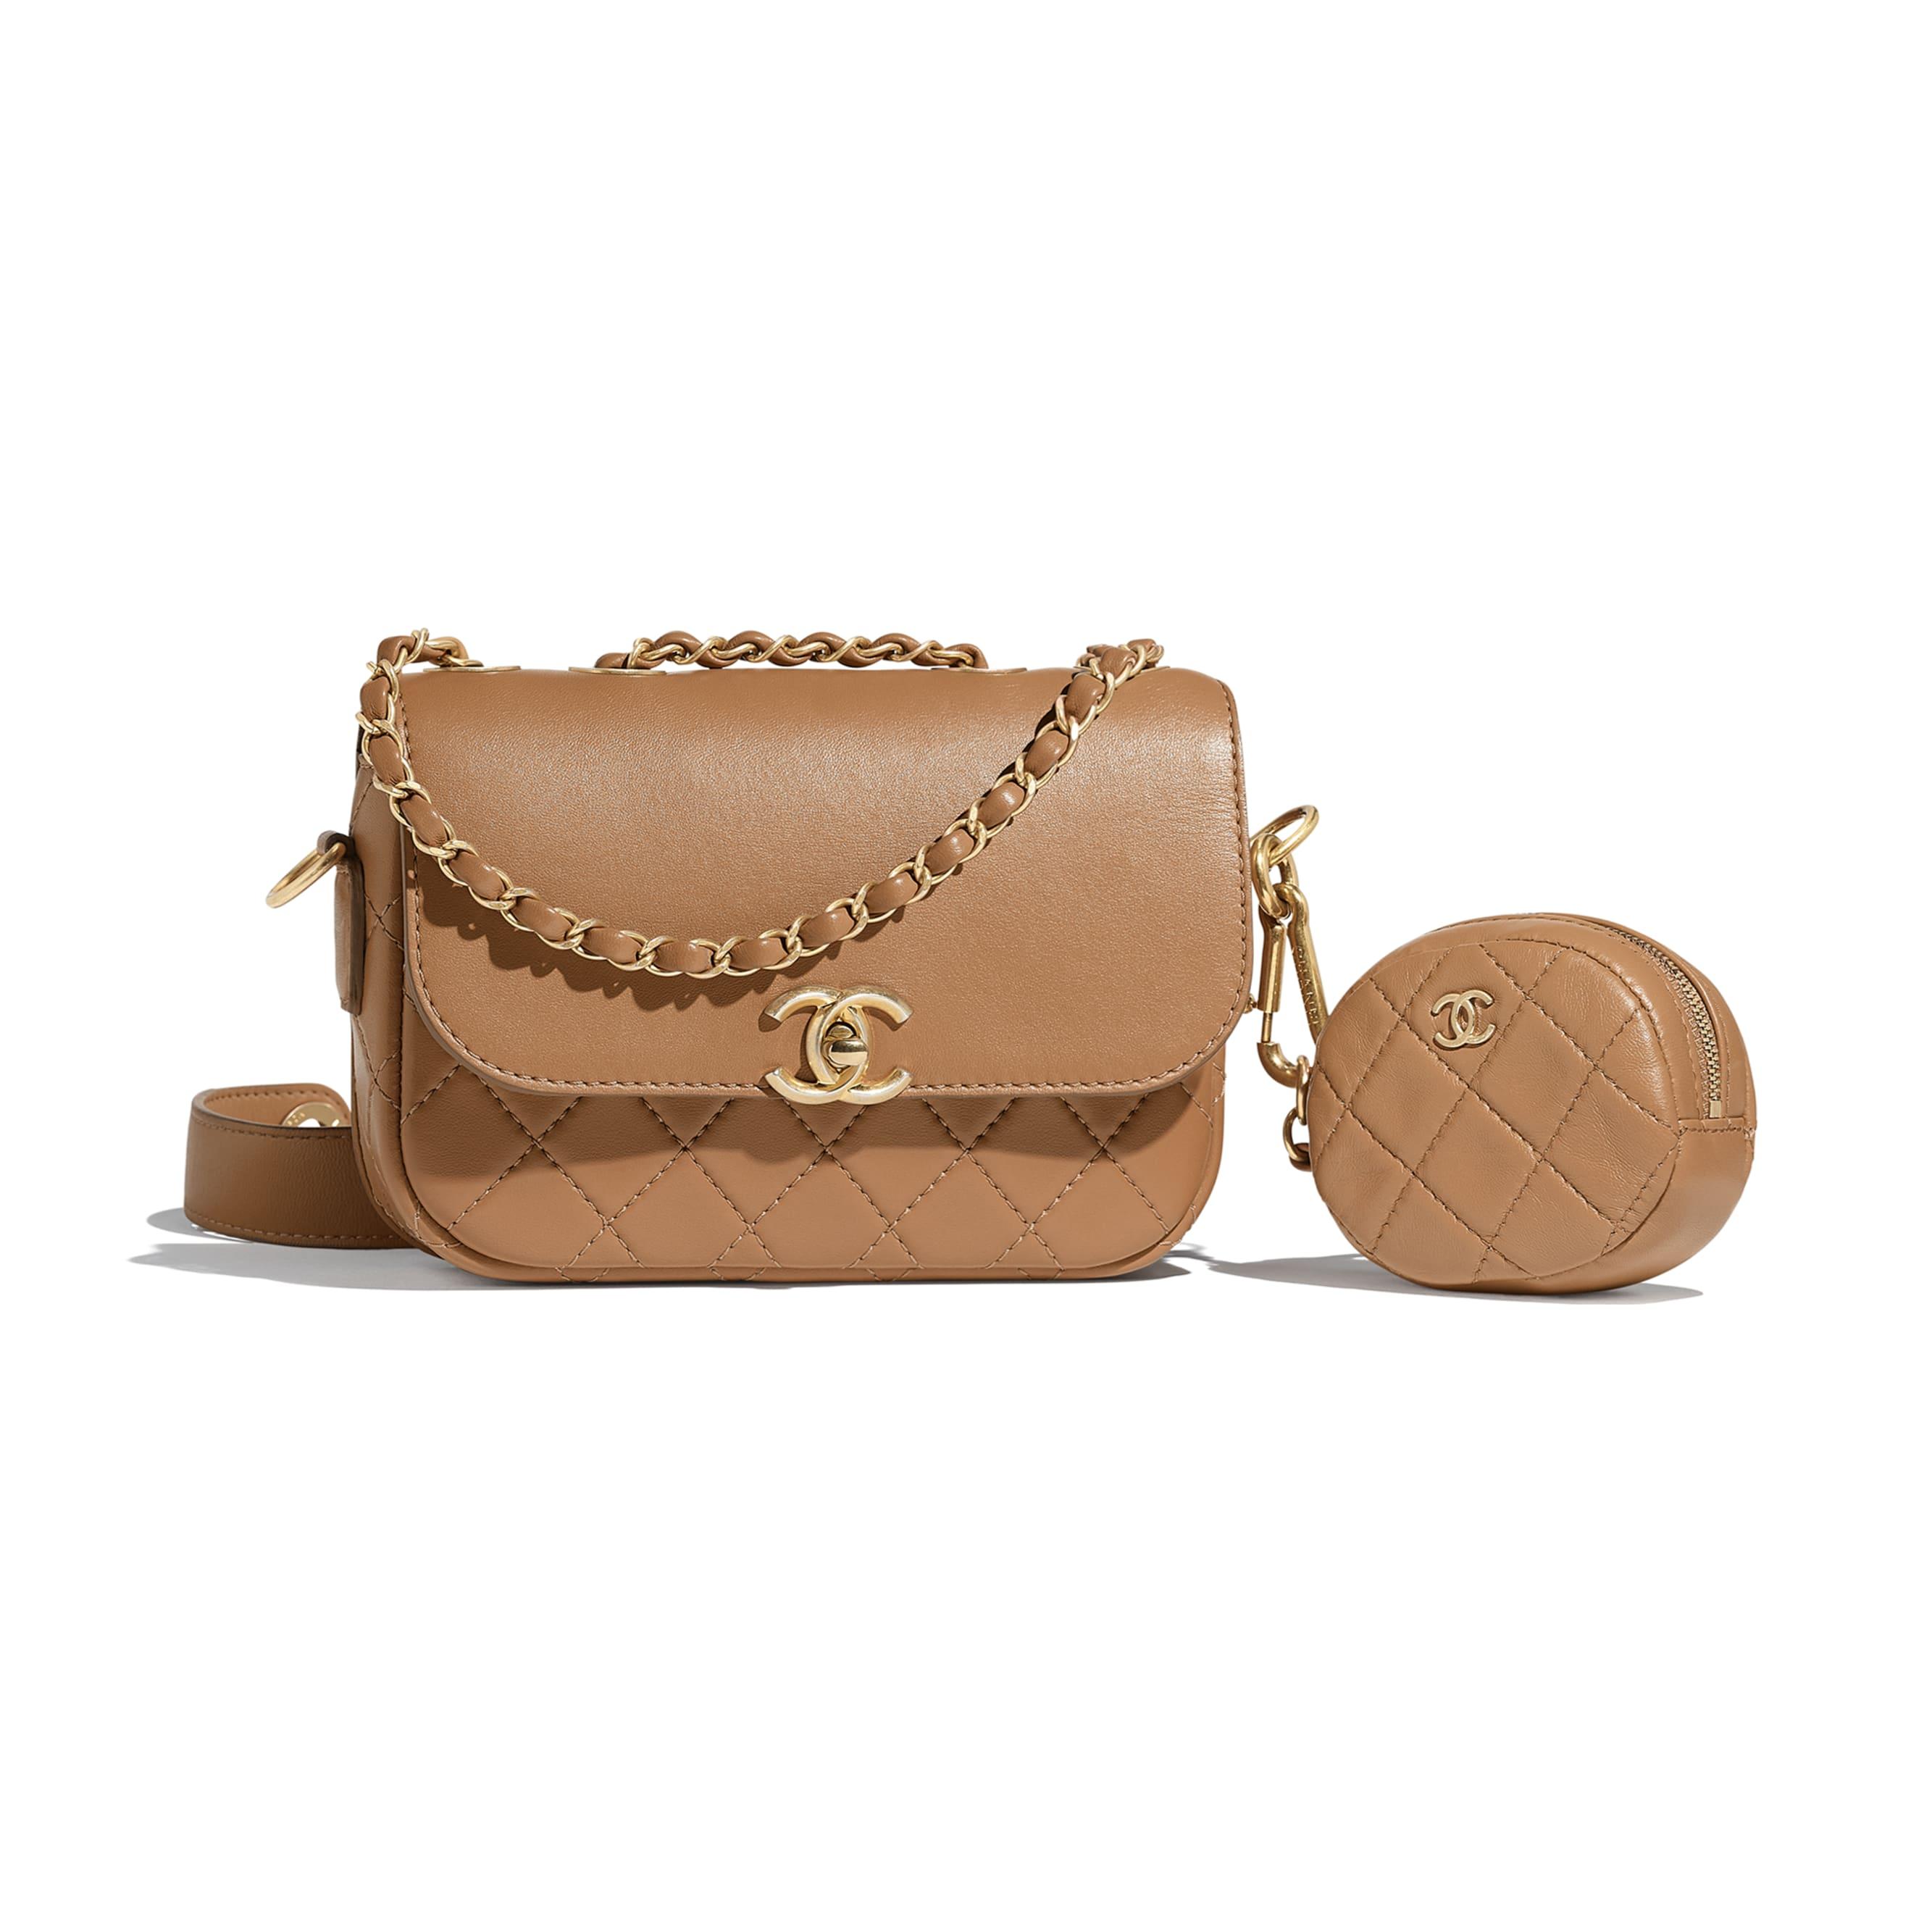 Flap Bag & Coin Purse - Beige - Calfskin & Gold-Tone Metal - Default view - see standard sized version